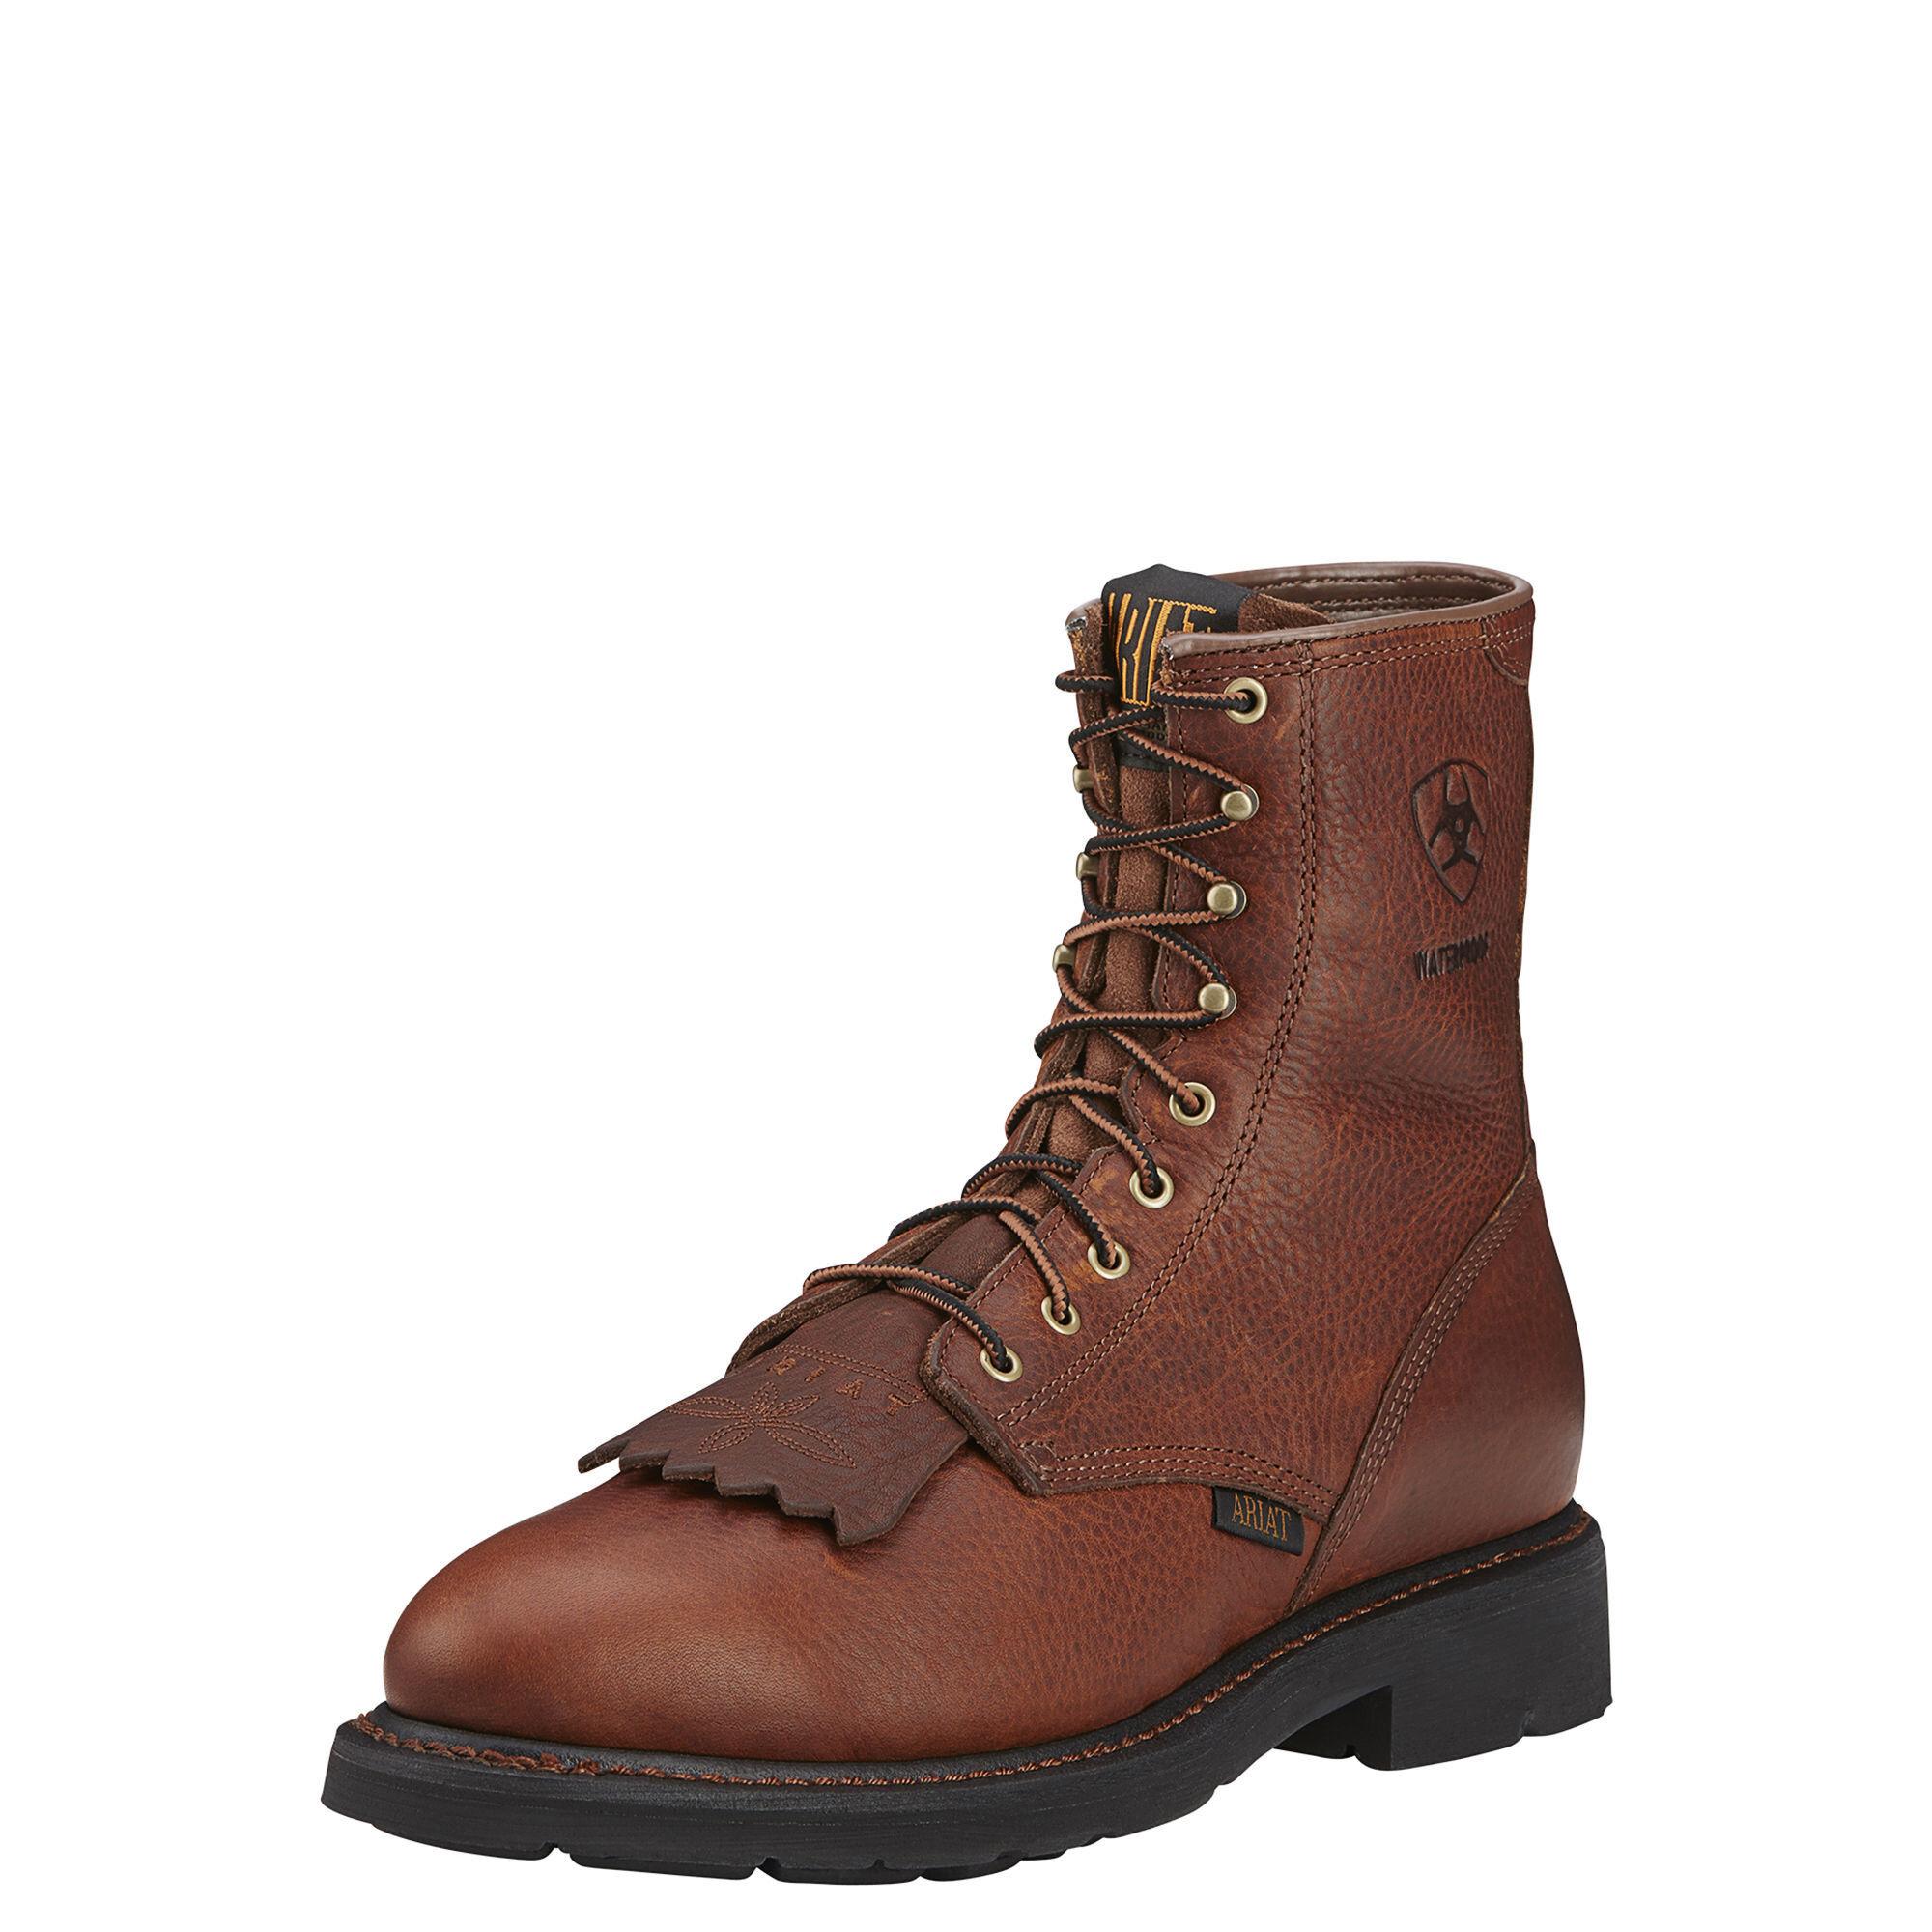 "Cascade 8"" Waterproof Work Boot"